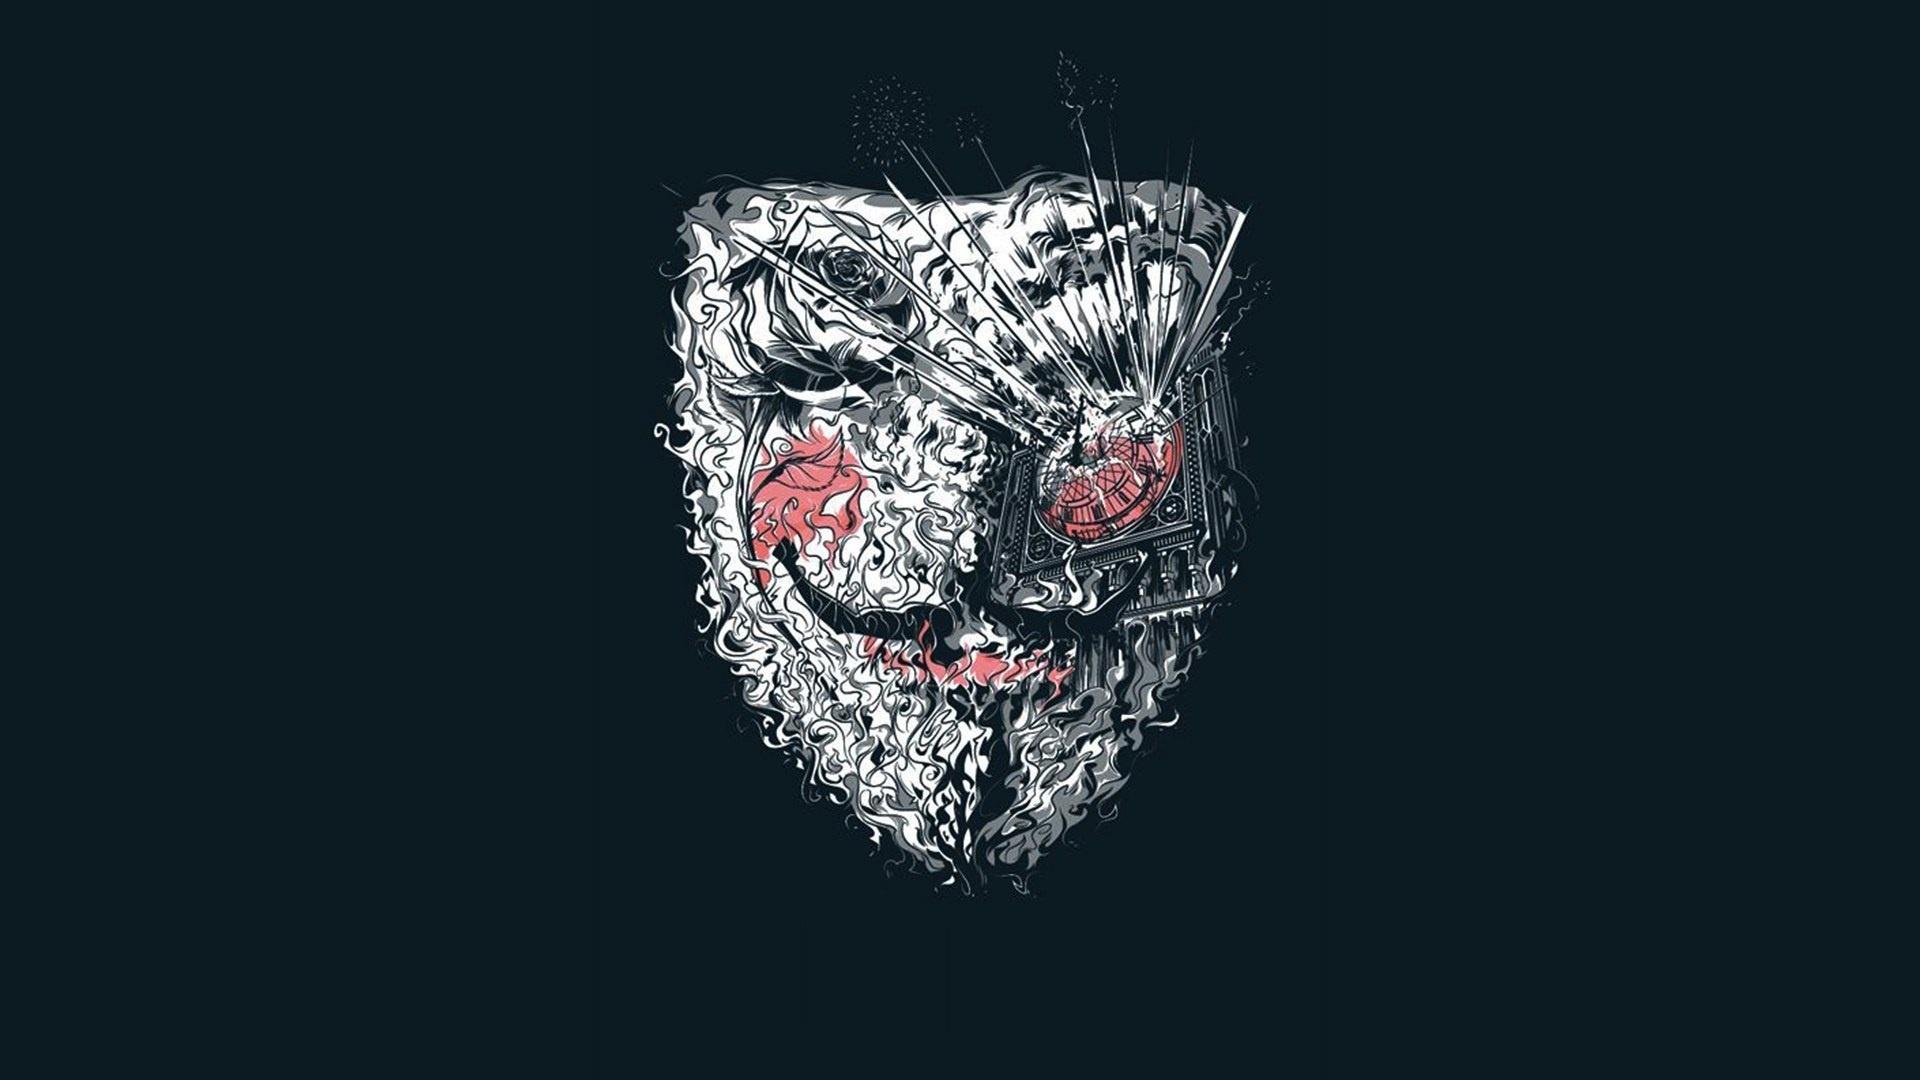 Anonymous V For Vendetta Artwork 1920 x 1080 Download Close 1920x1080